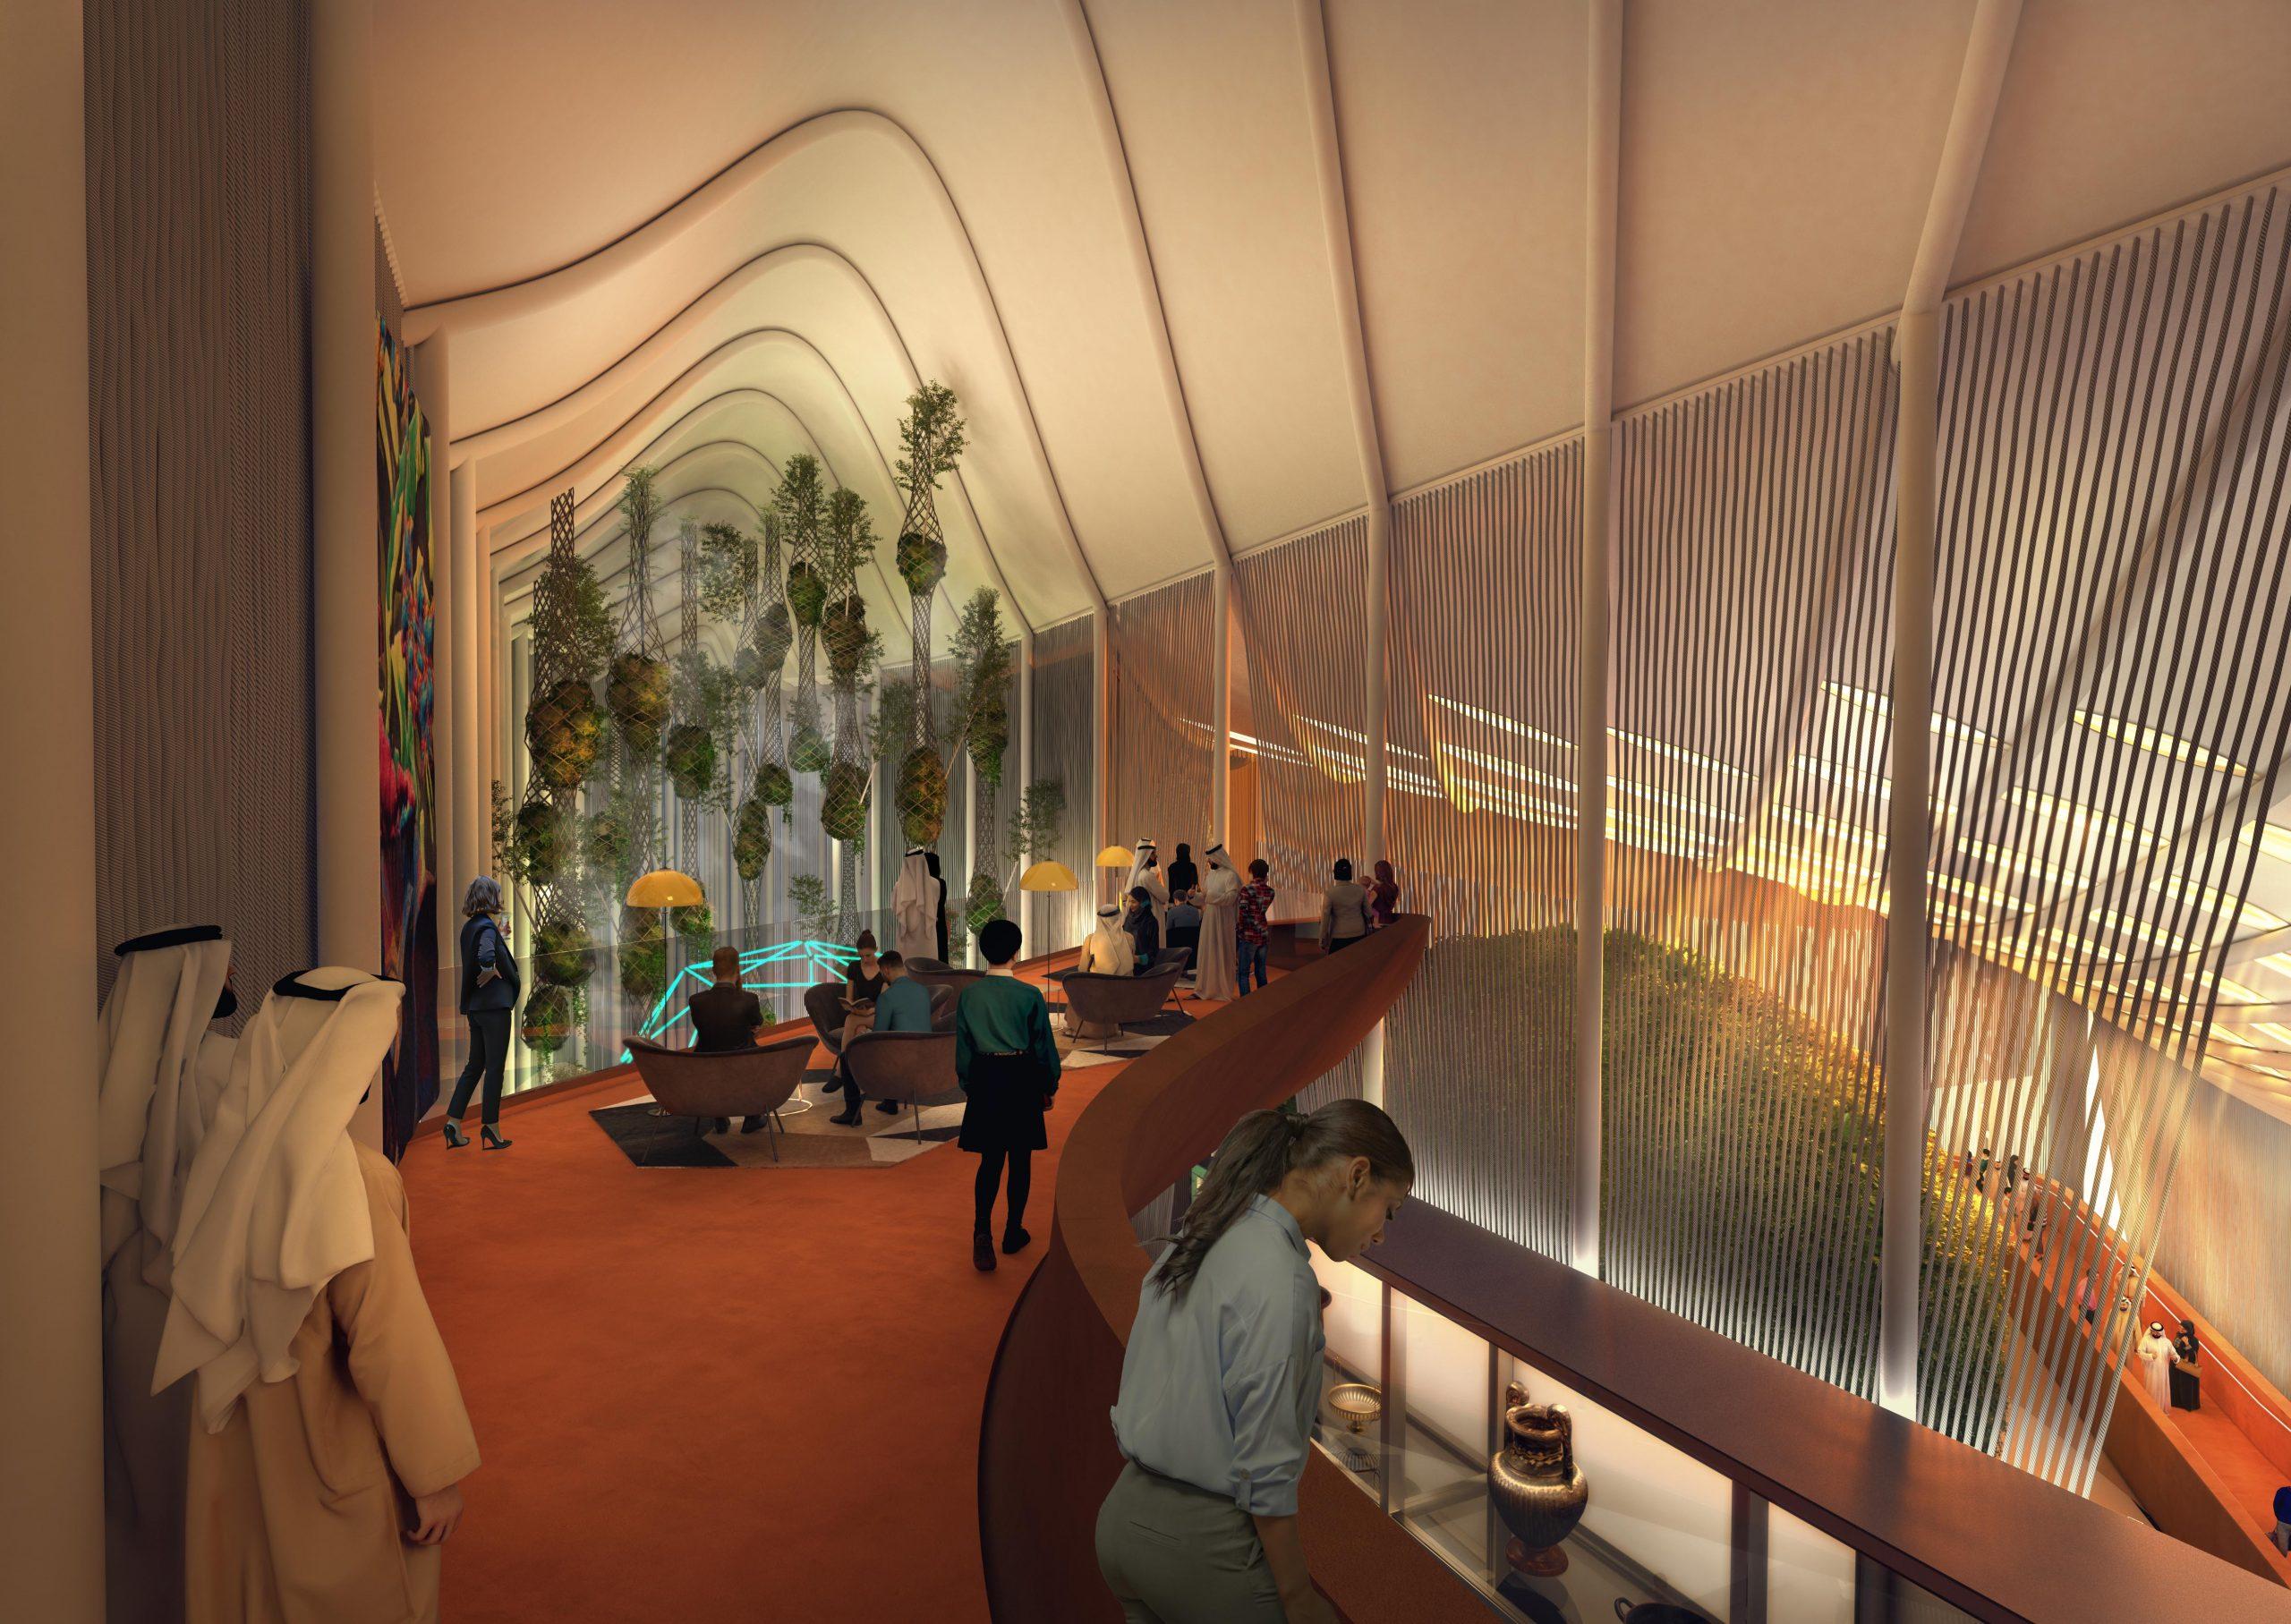 201910 Unveiling Italian Pavilion 2020_Renderings by CRA_7